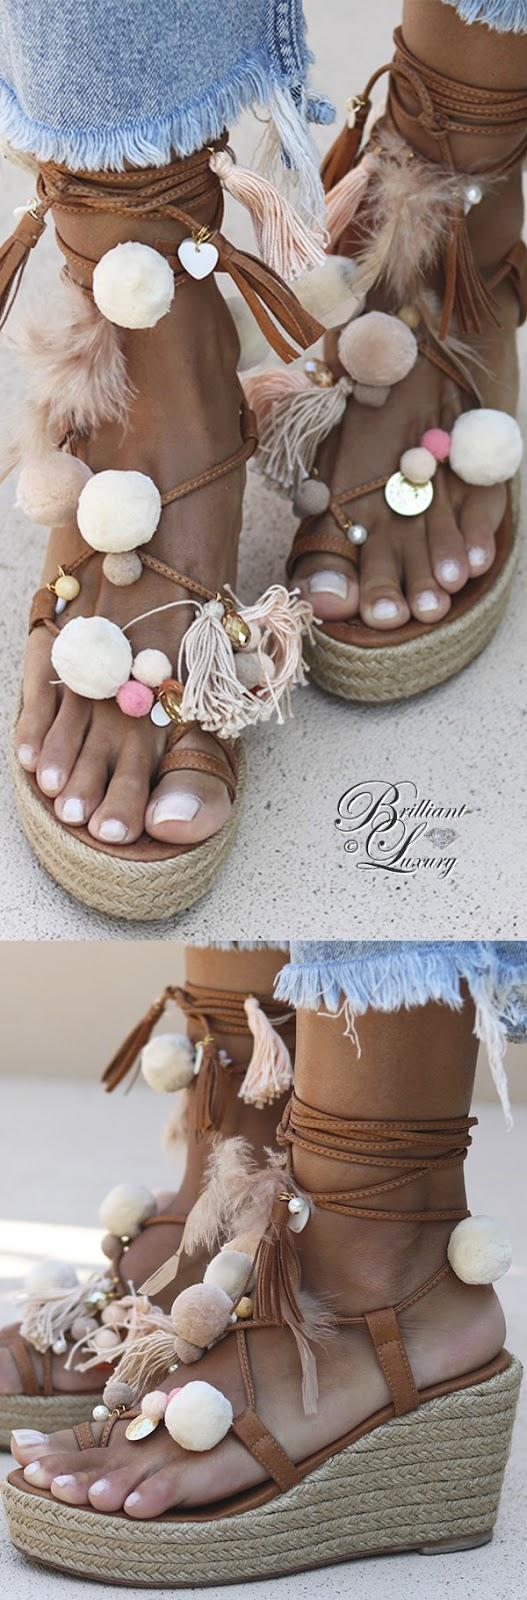 Brilliant Luxury ♦ Alameda Turquesa Gouldian wedges vanilla